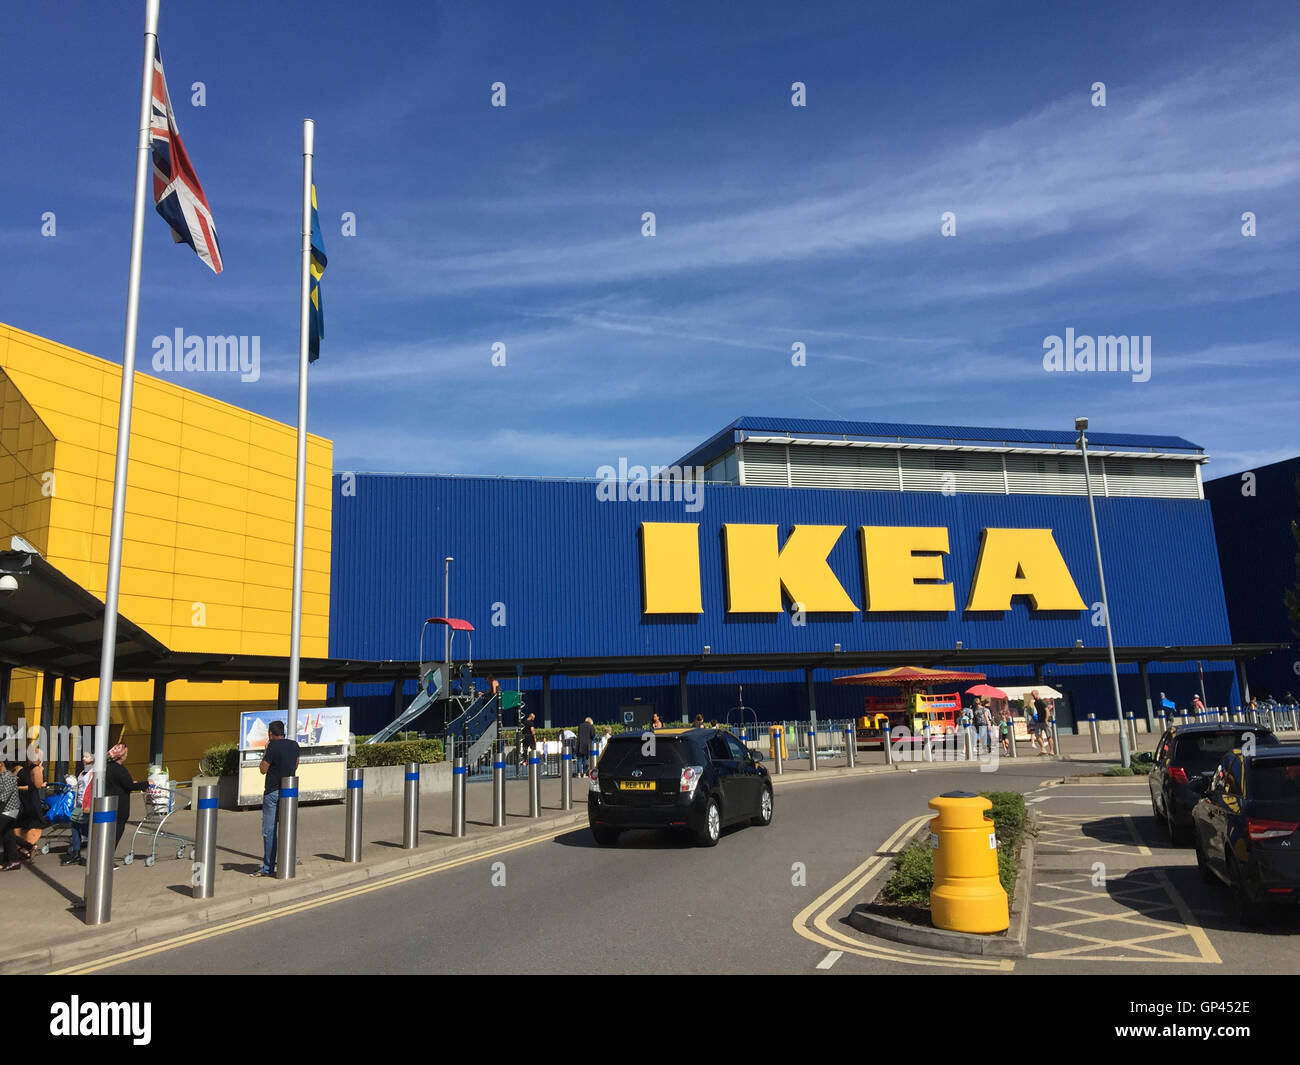 IKEA store in Theale near Reading, Berkshire. Photo Tony Gale - Stock Image